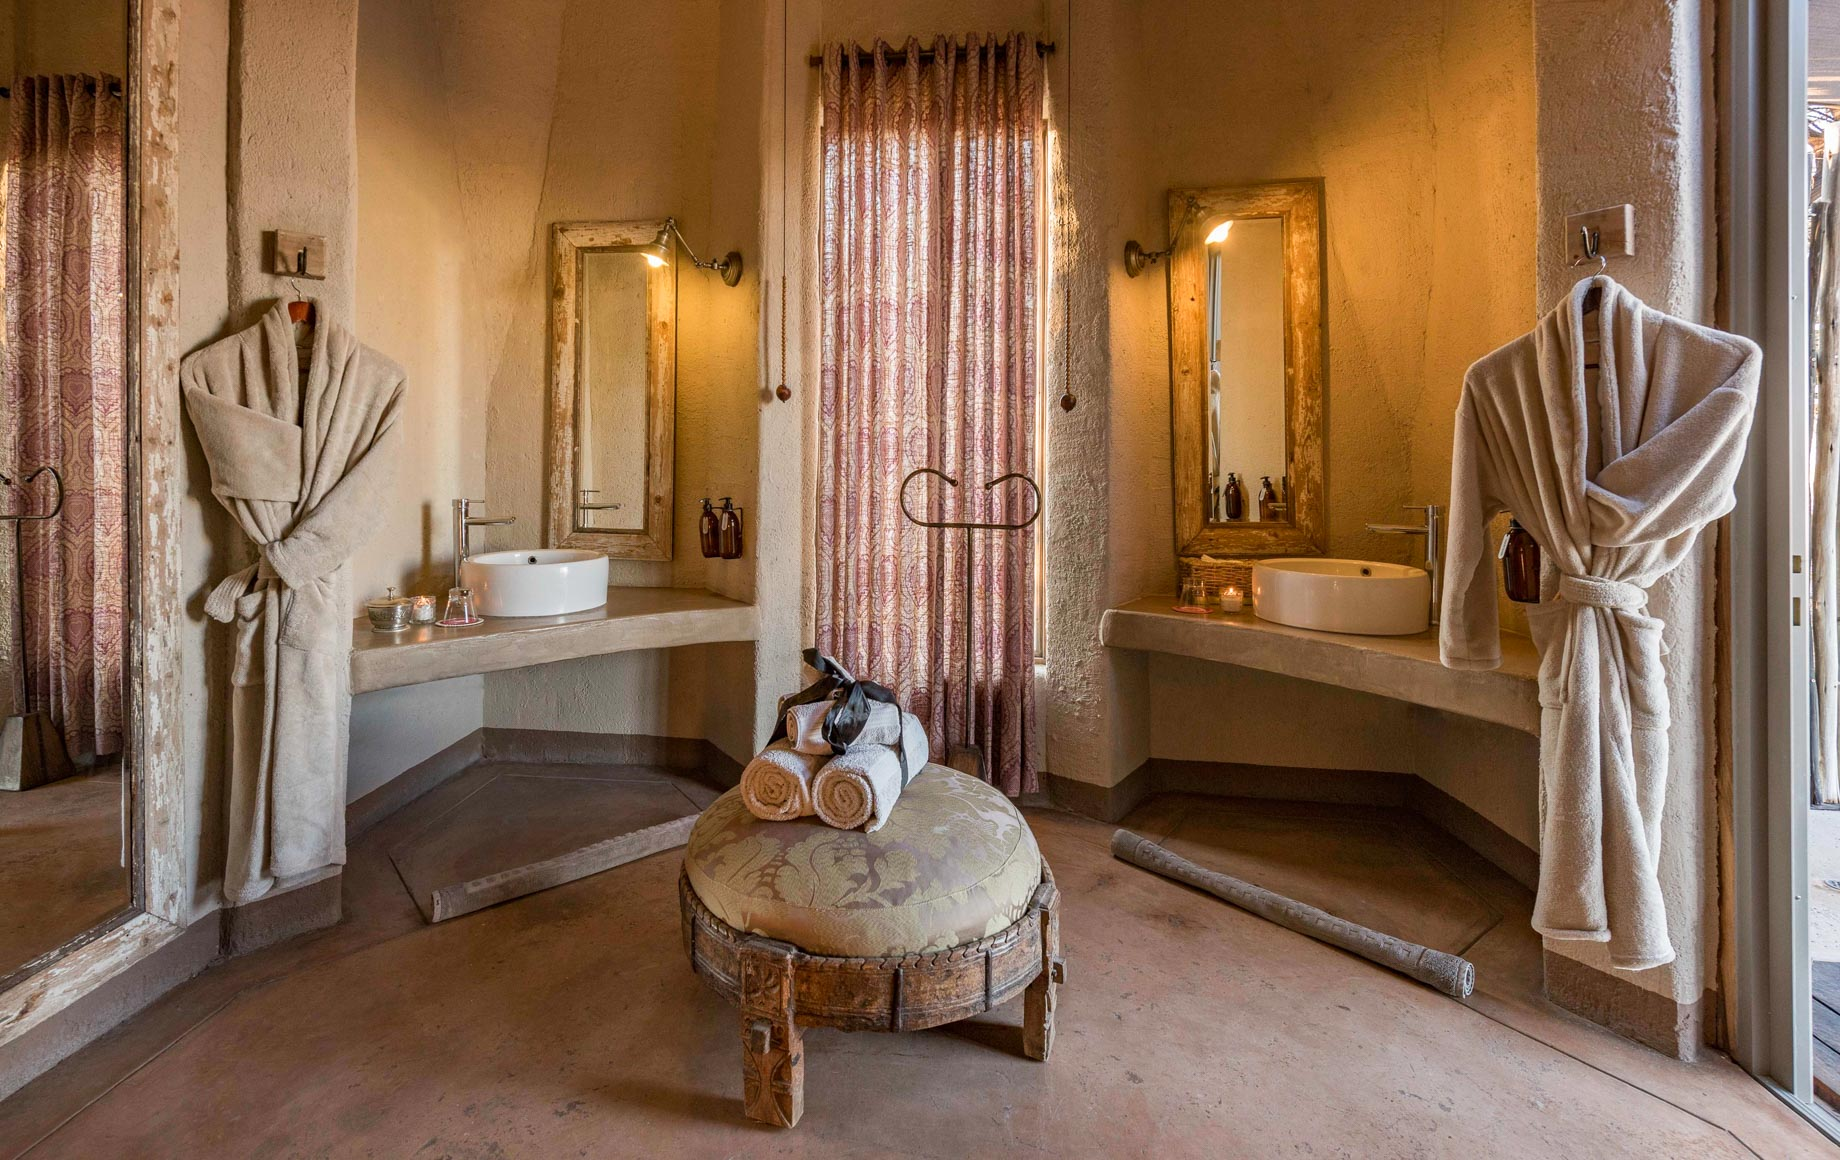 Bathroom interior of Onguma the Fort